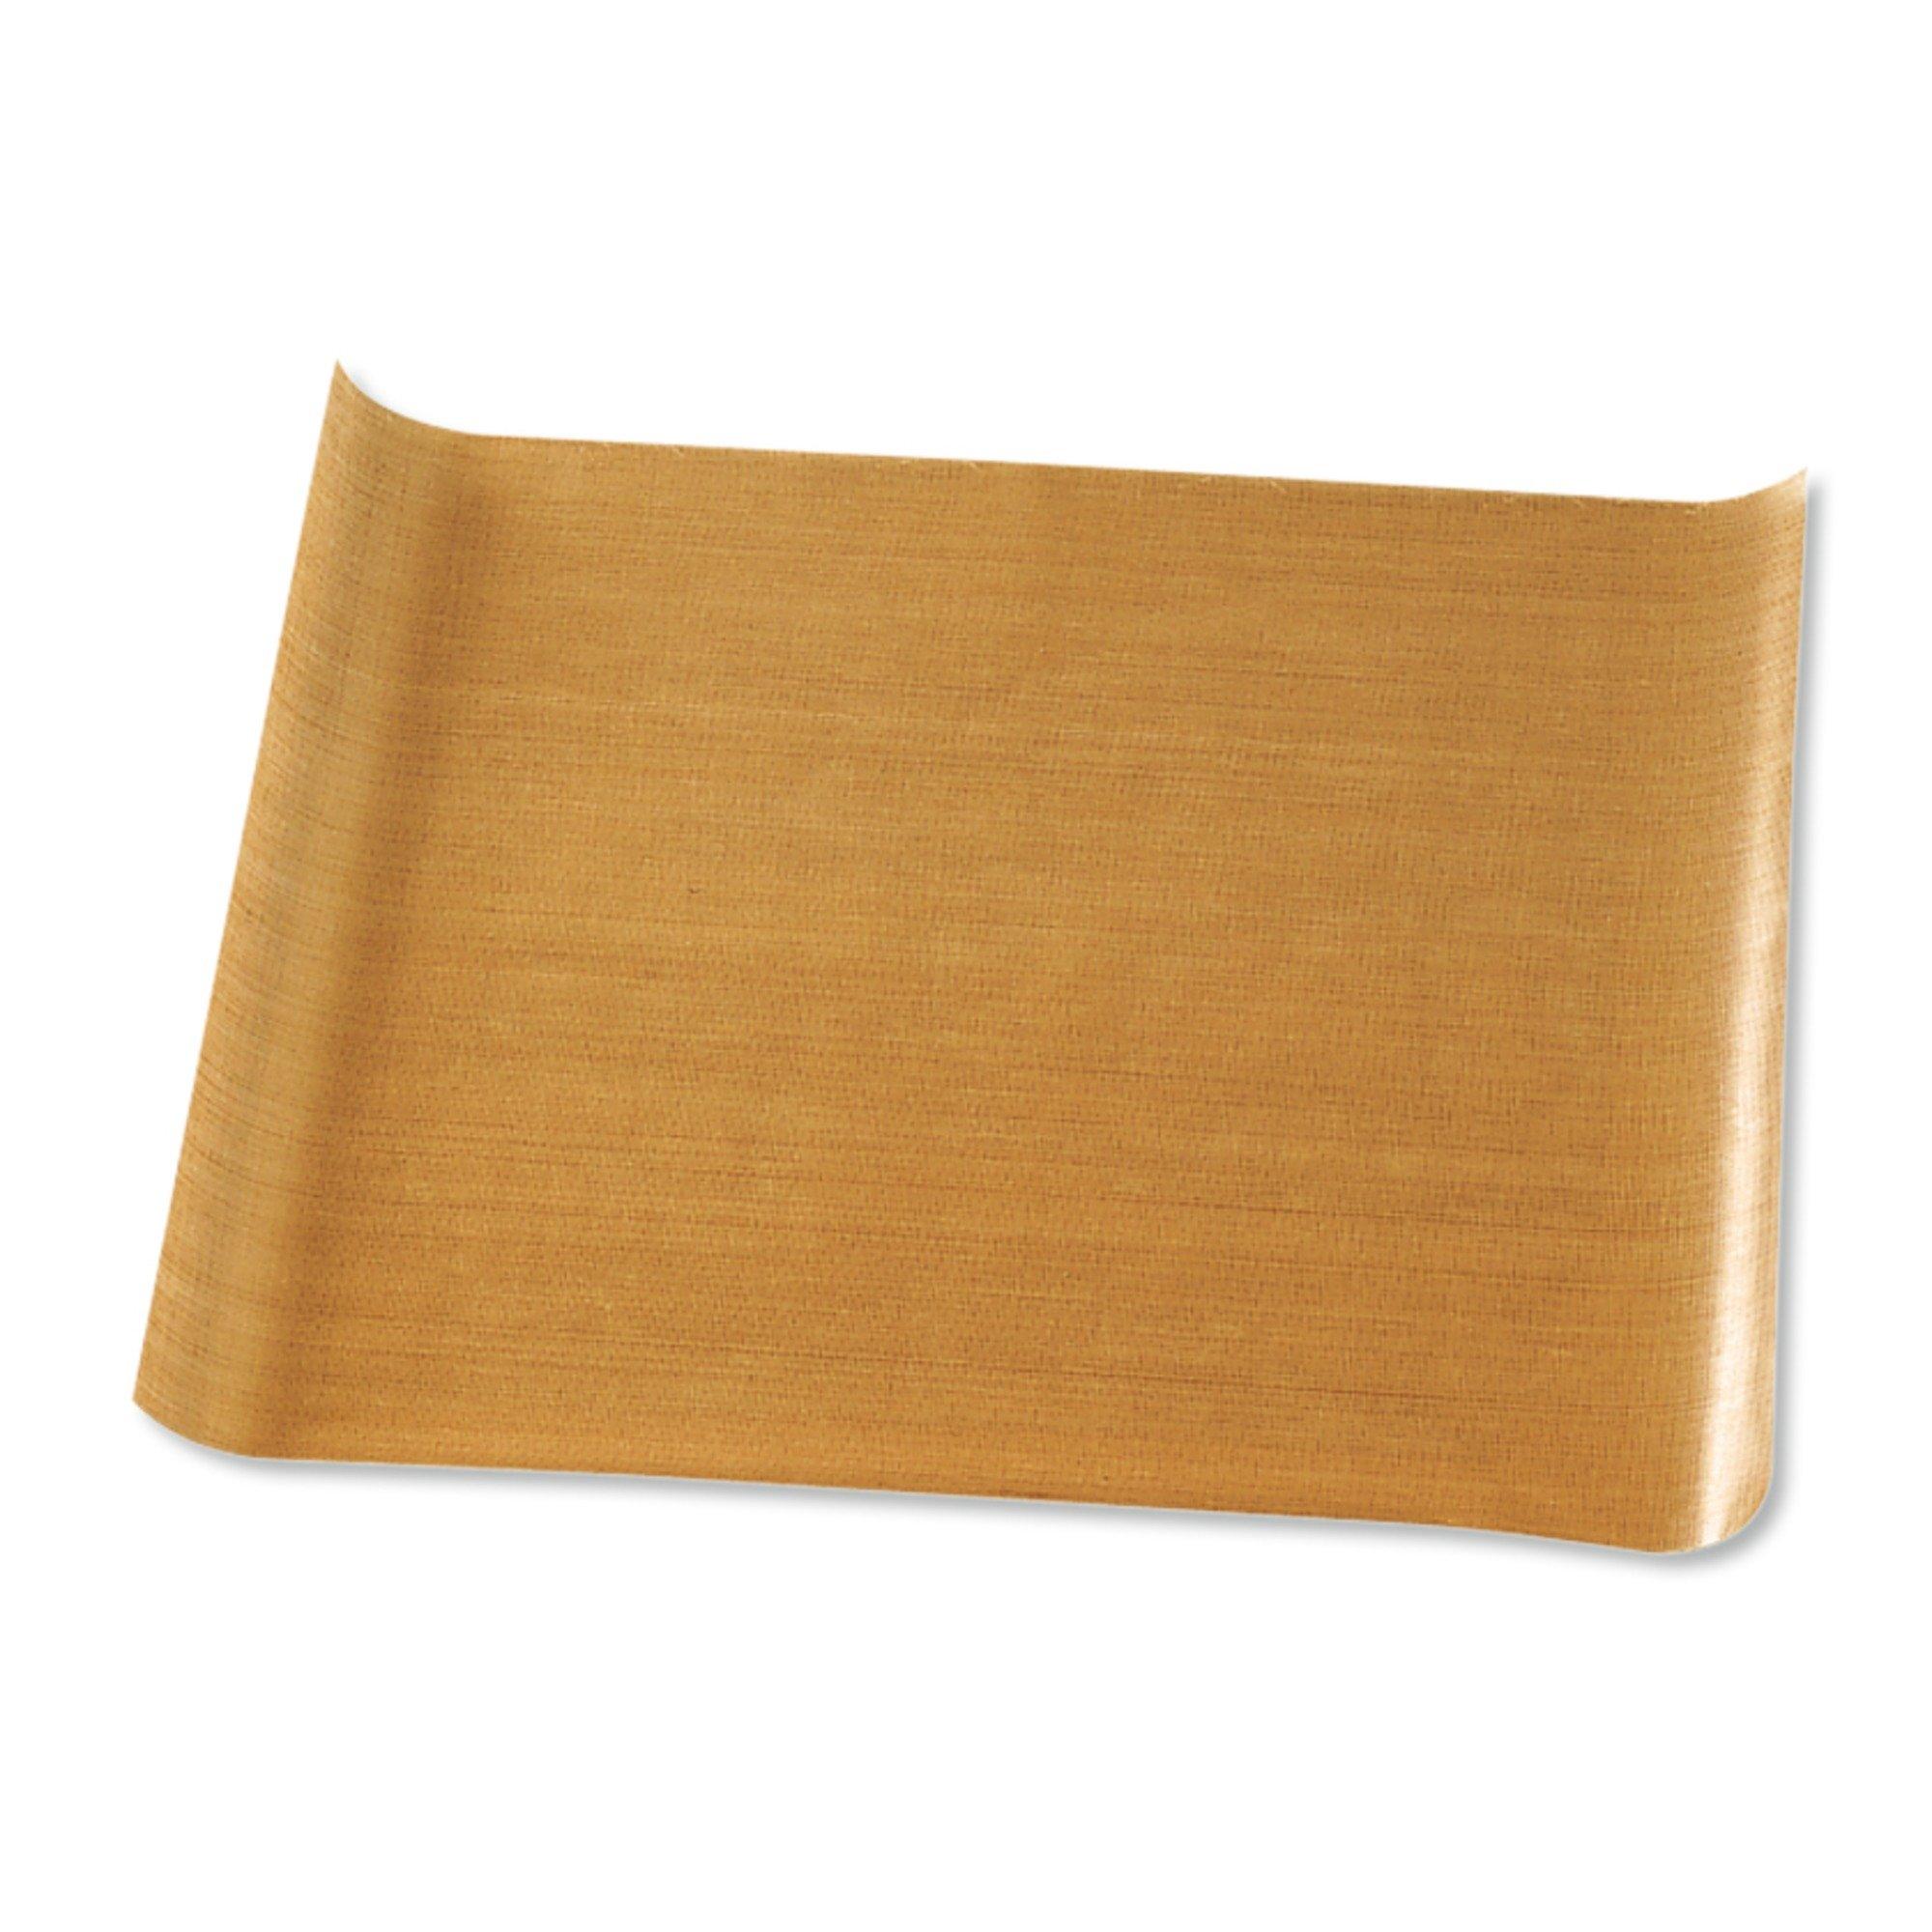 Dauerbackfolie 50 x 40 cm Pâtisserie